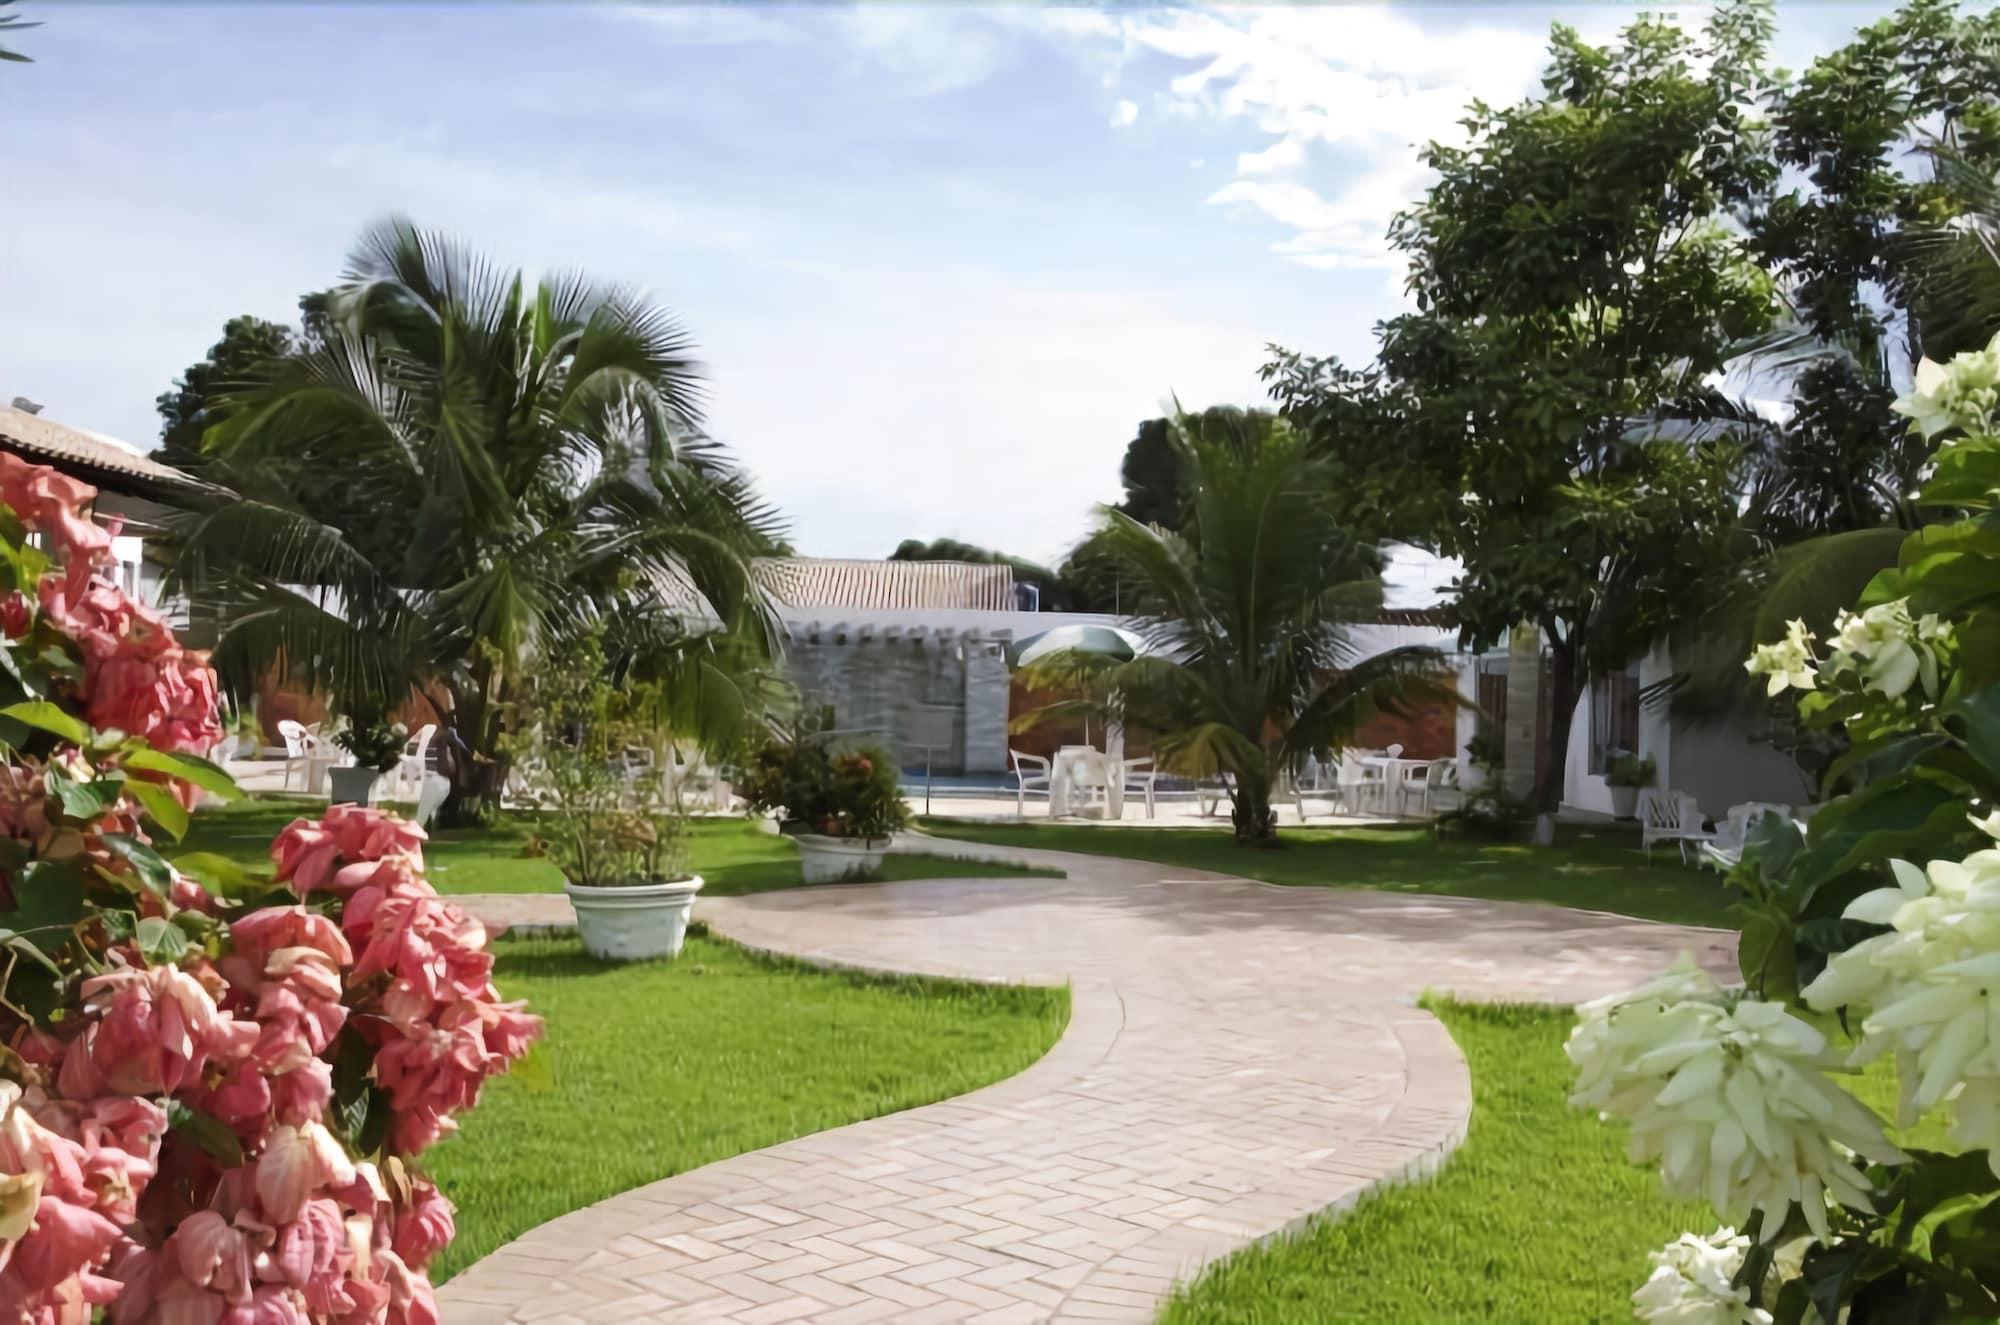 Delcas Hotel, Cuiaba